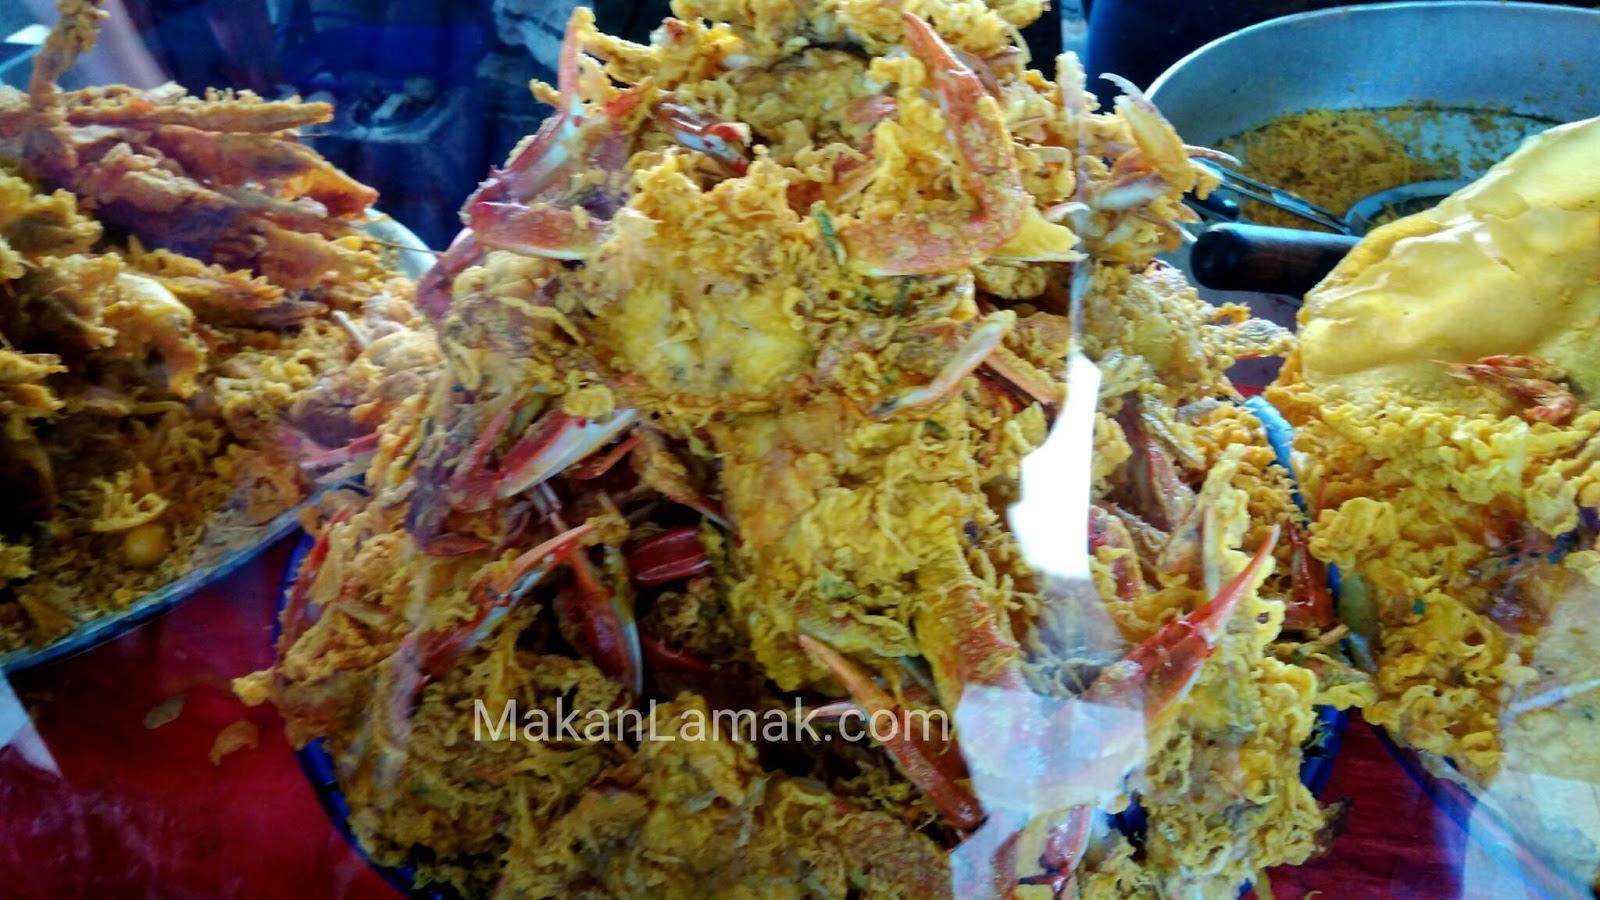 cemilan goreng kepiting yang dapat ditemui di pantai gandoriah pariaman